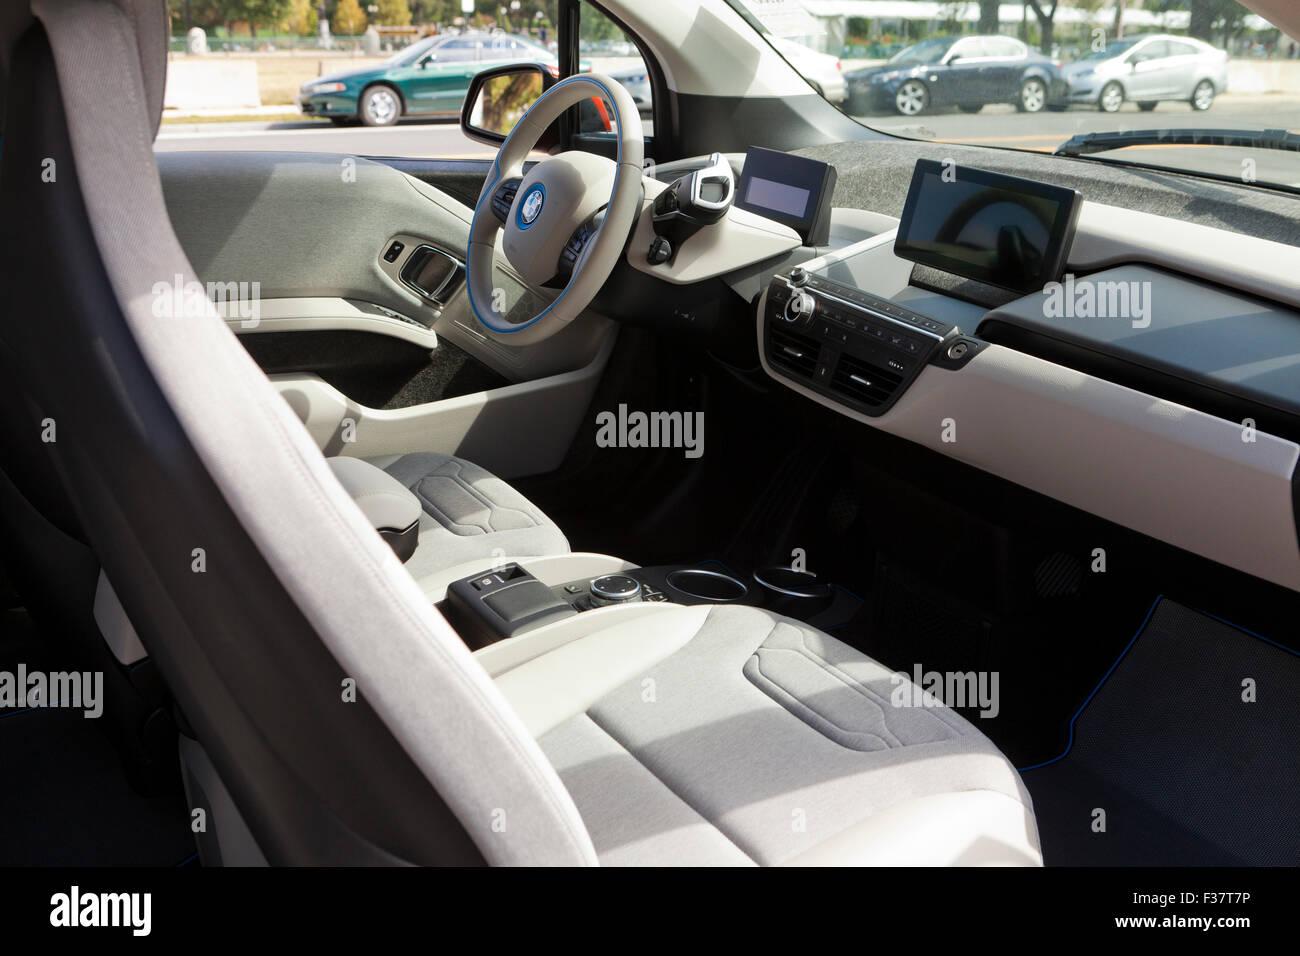 Bmw I3 Electric Car Interior Usa Stock Photo 88068506 Alamy